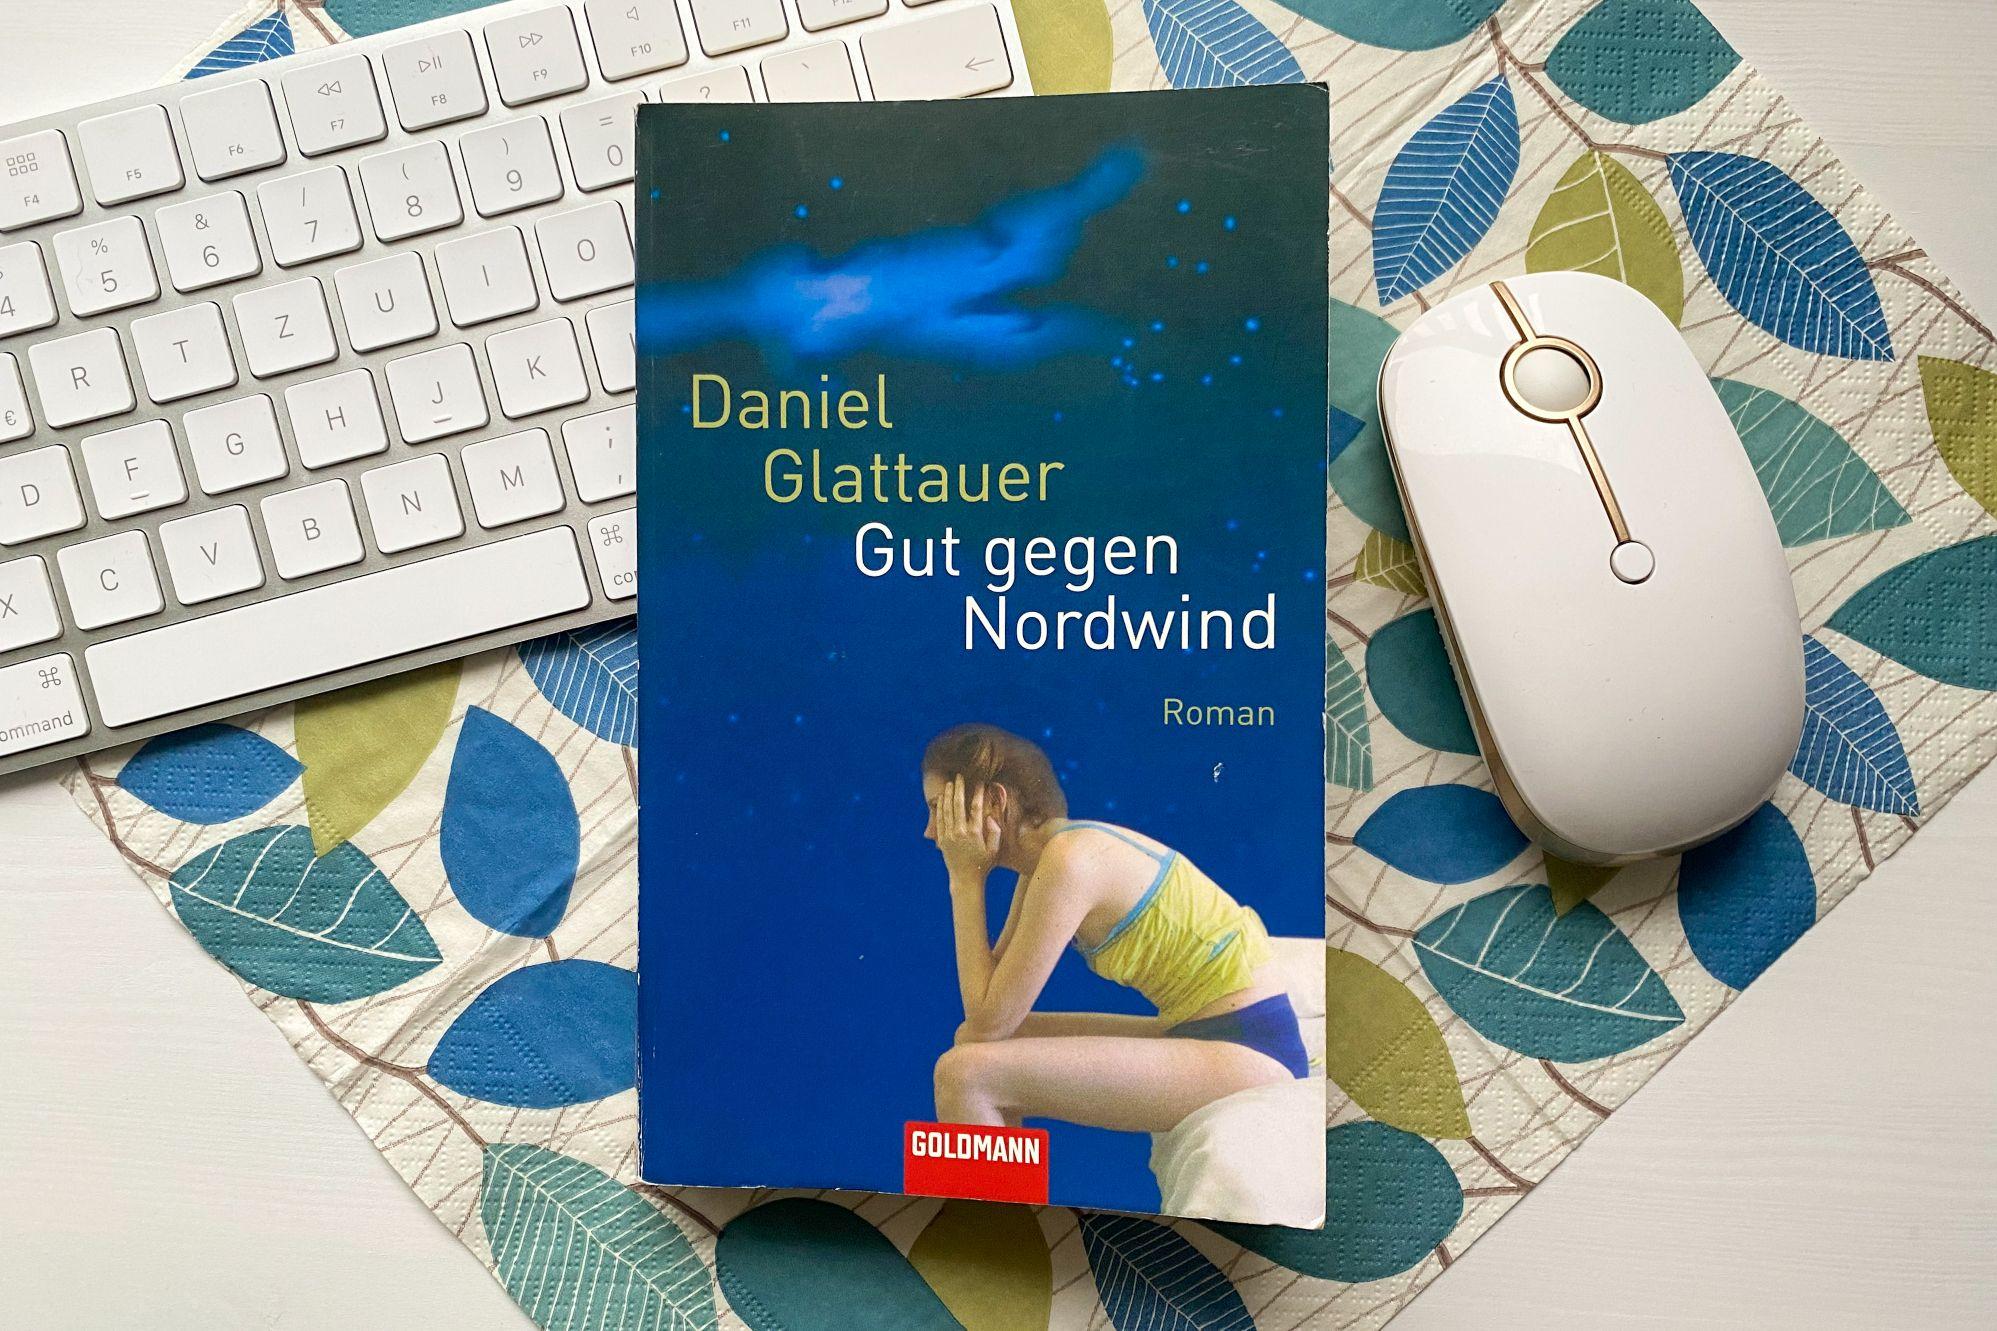 Daniel Glattauer Gut gegen Nordwind Liebesroman Wien Email E-Mail